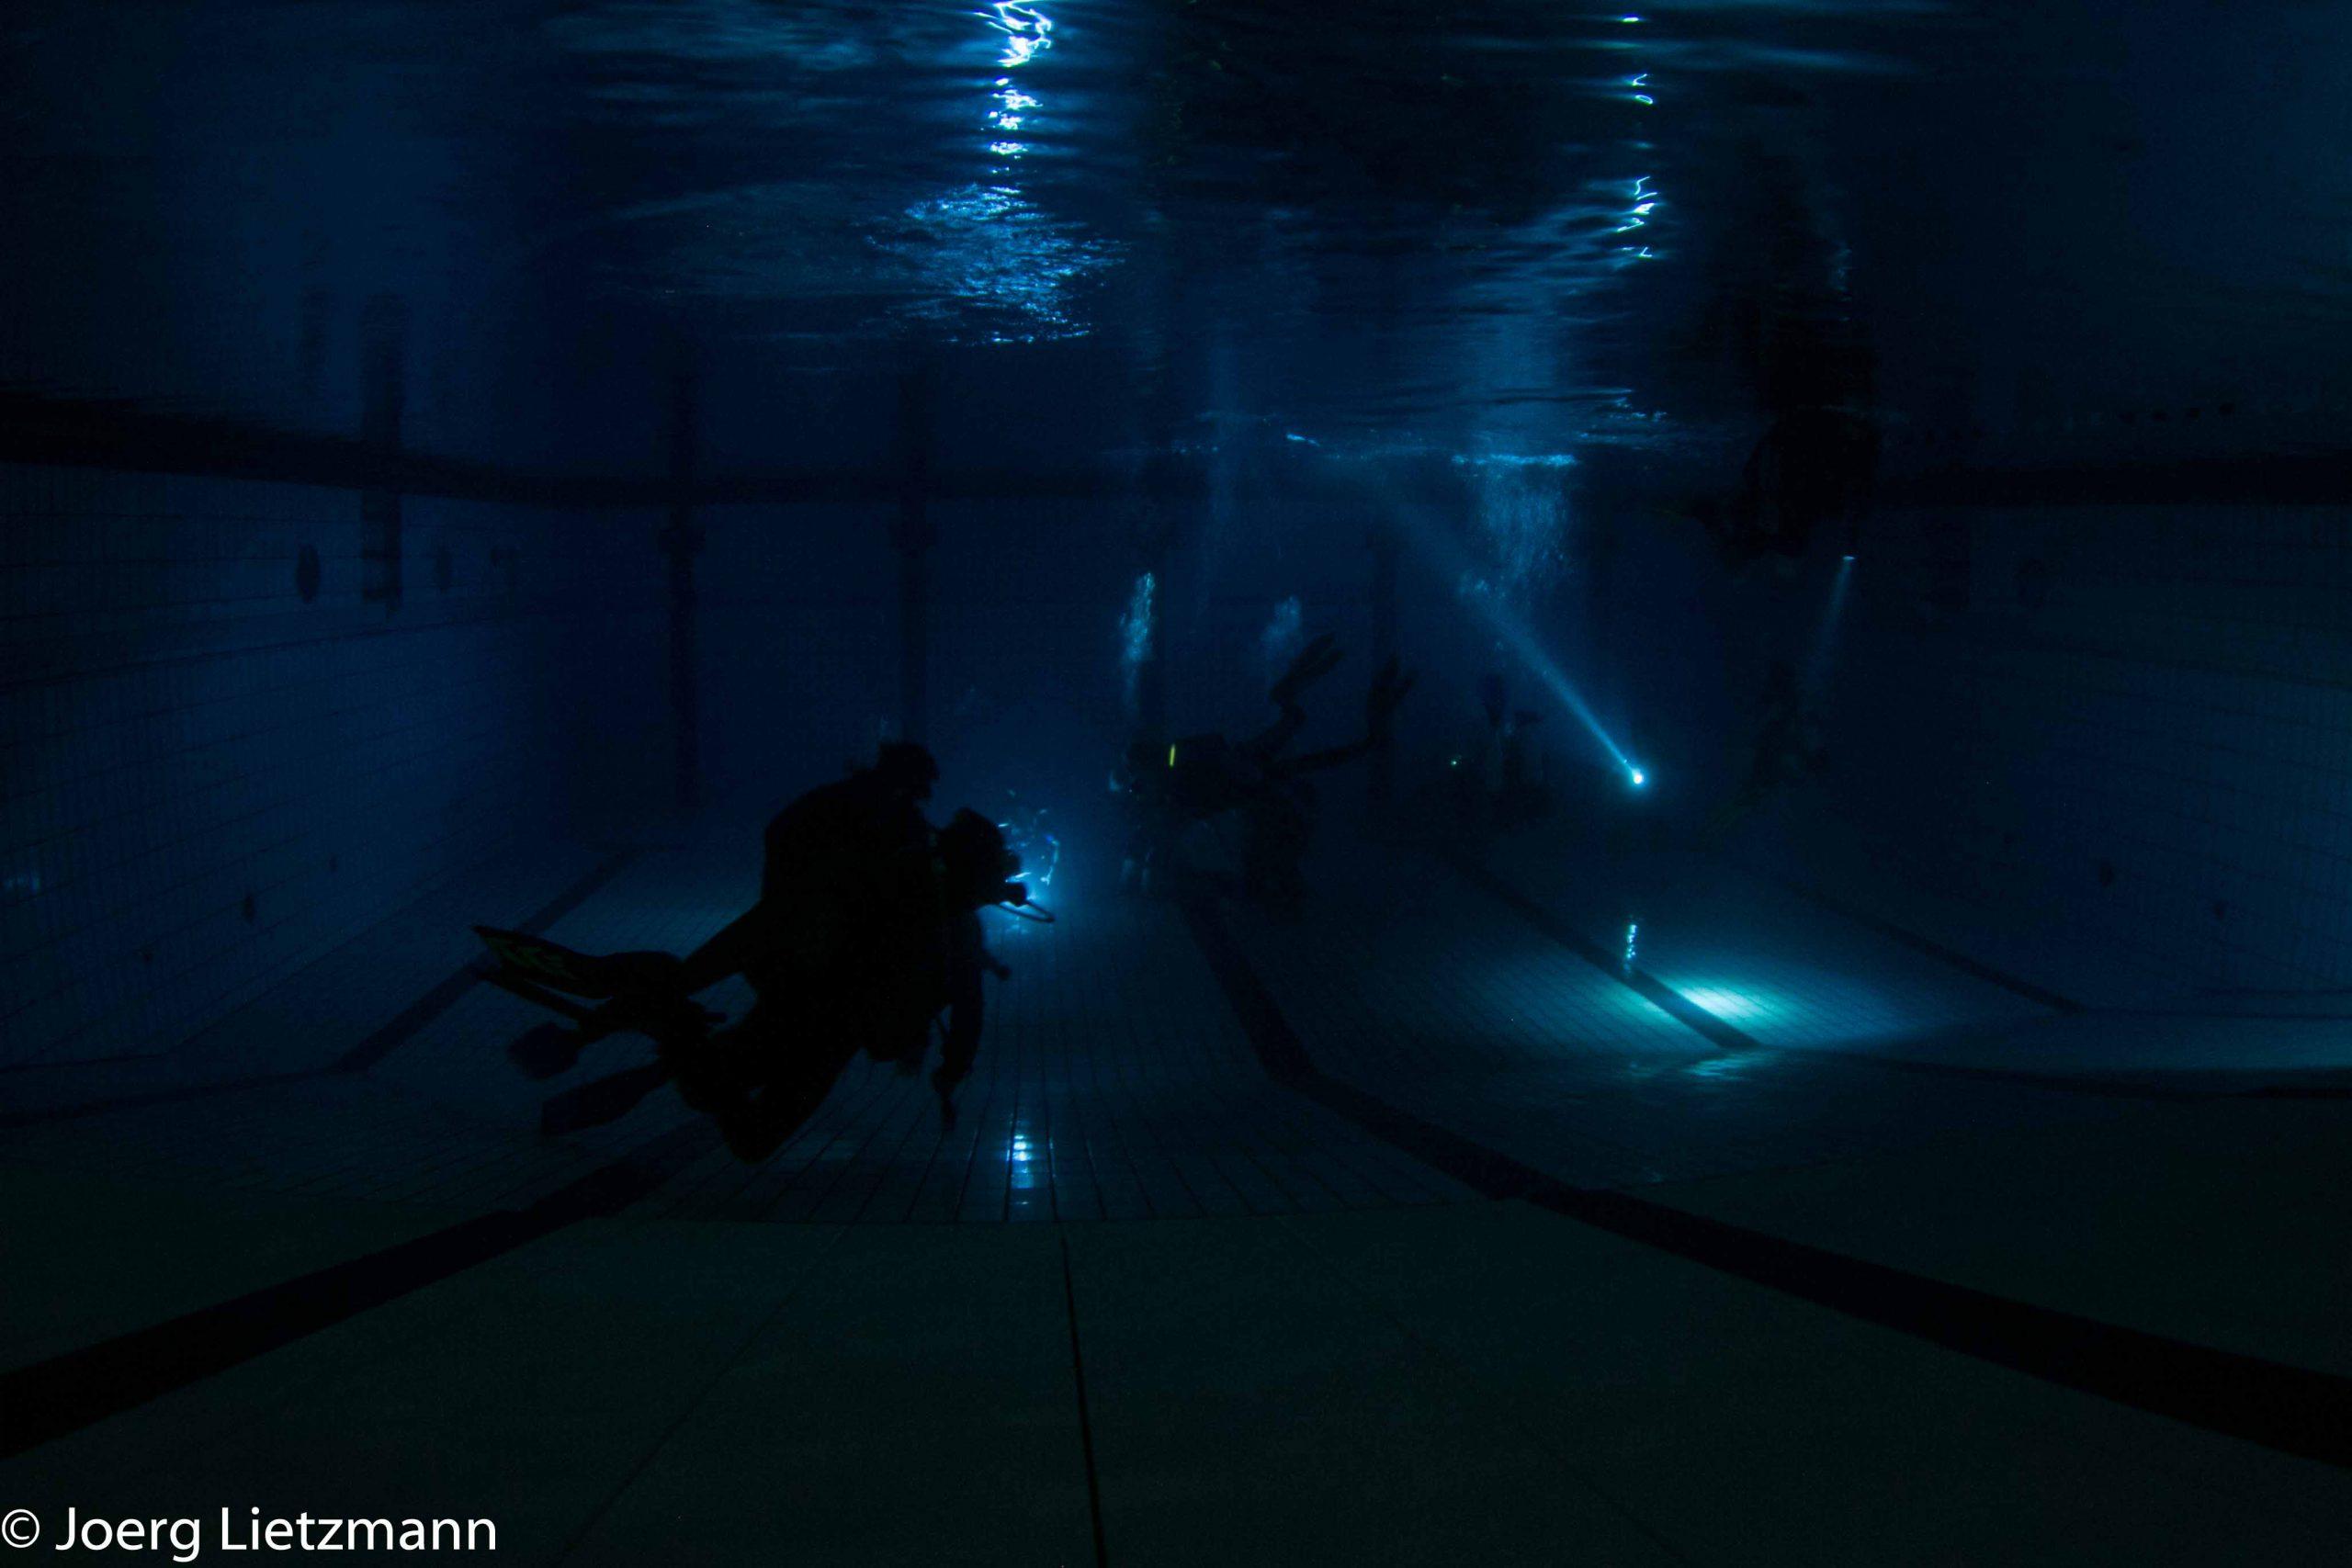 Night Dive am 15. Februar im Hallenbad Baienfurt